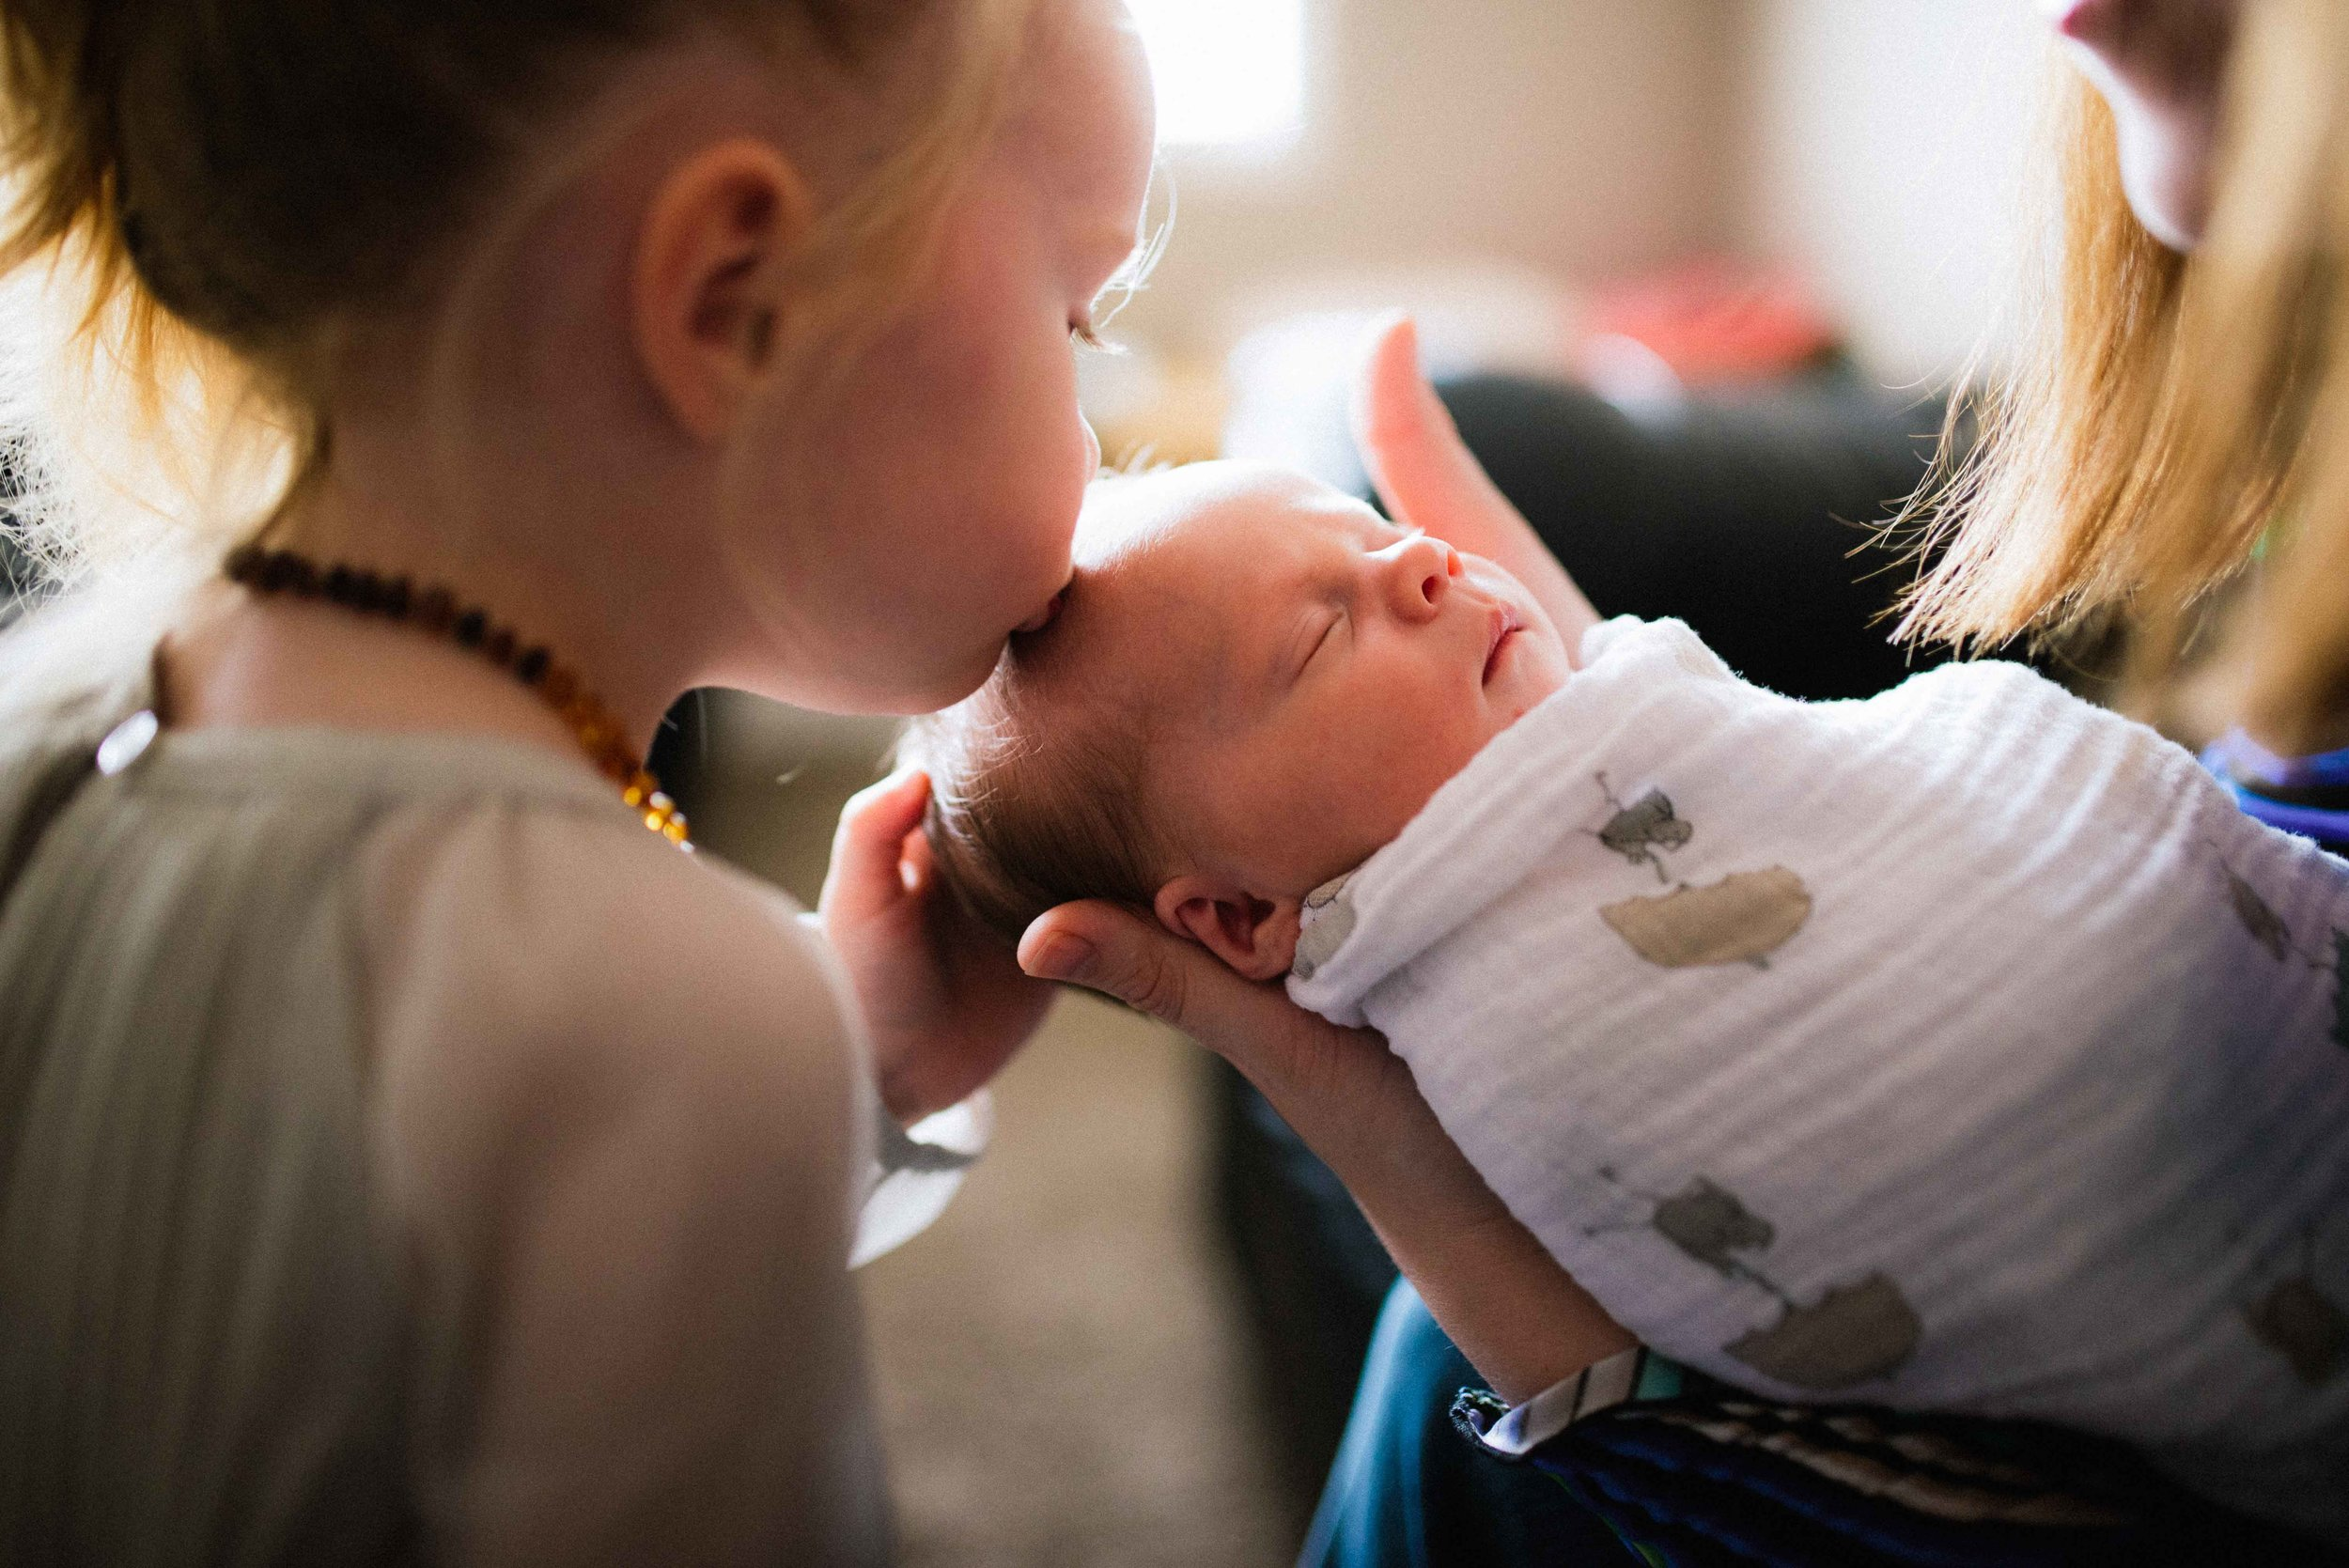 Calgary Canmore Banff Fernie Newborn Family Maternity Photography-55.jpg